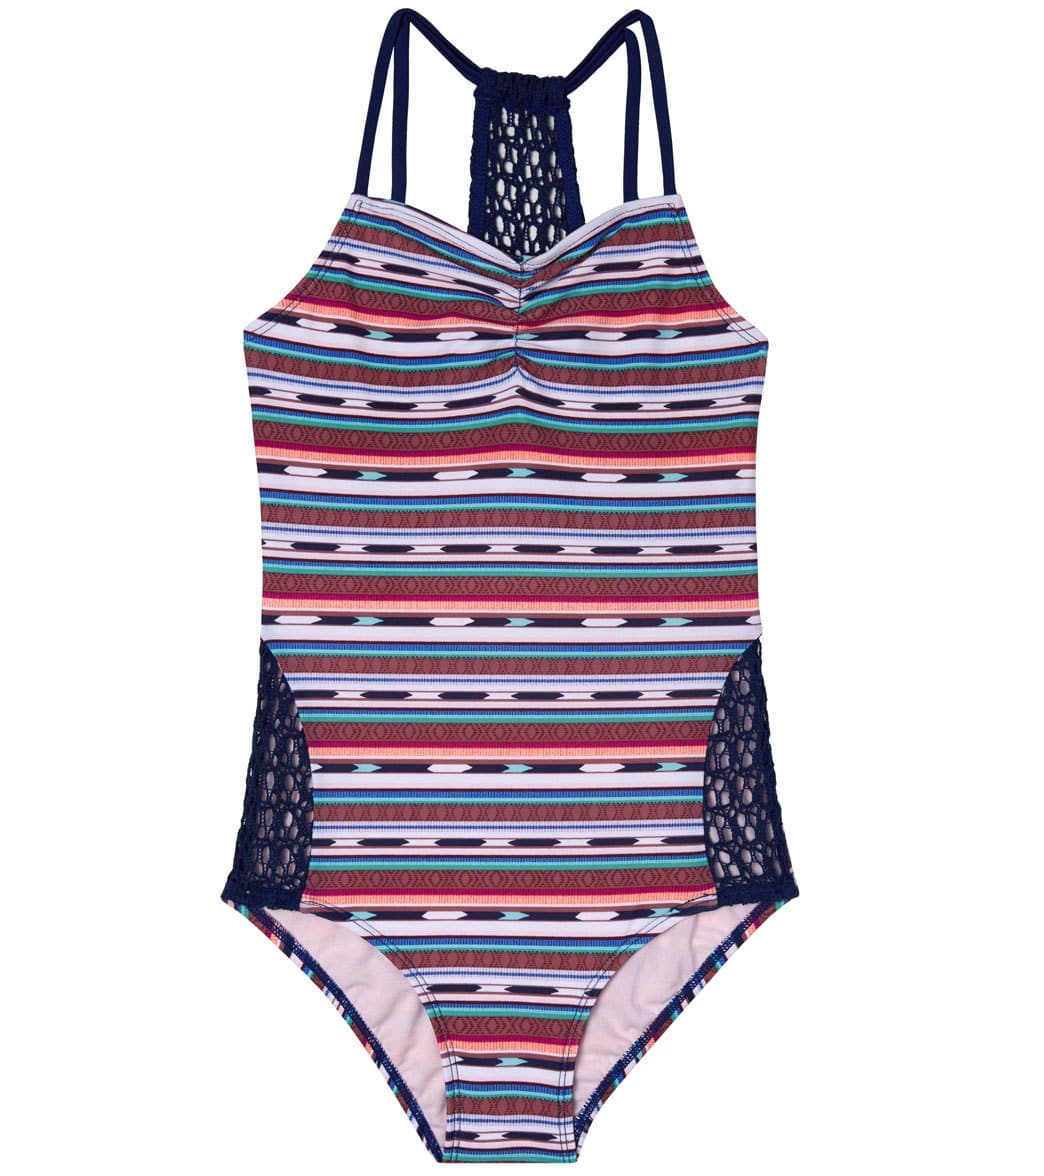 50c11d29d6ed4 Gossip Girls' Desert Stripe One Piece Swimsuit (Big Kid) at SwimOutlet.com